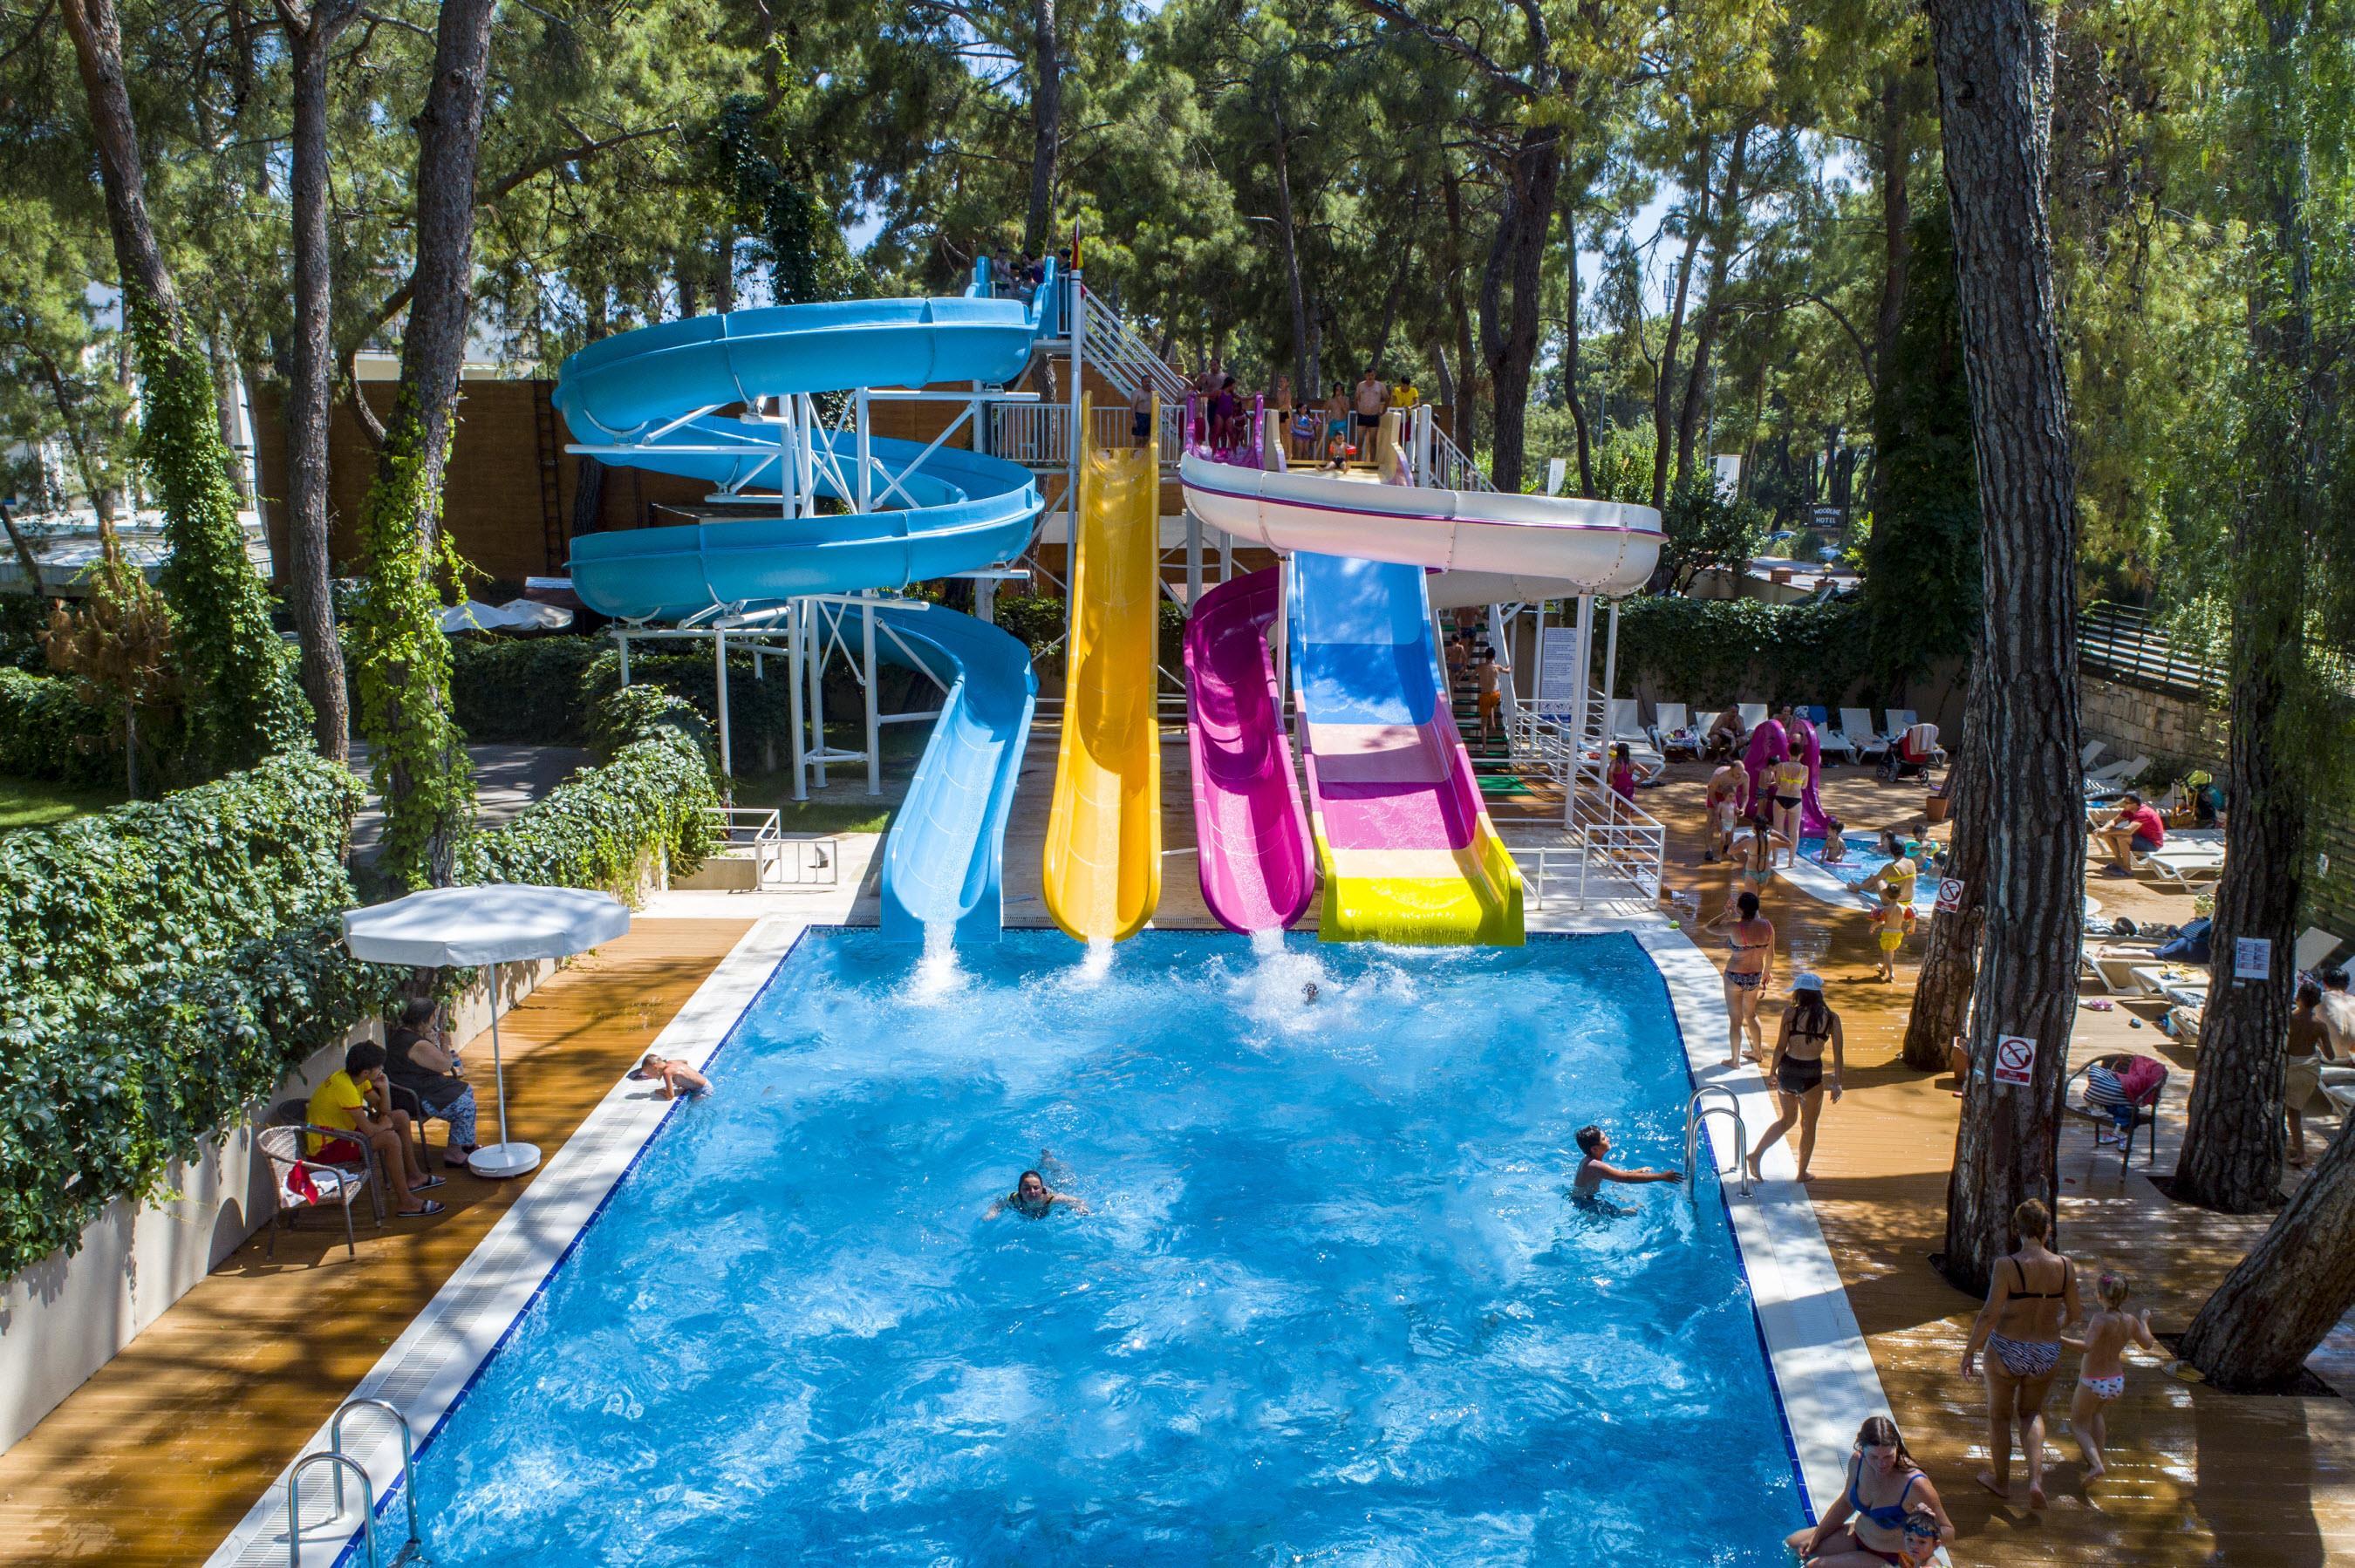 http://www.orextravel.sk/OREX/hotelphotos/ulusoy-kemer-holiday-club-area-0011.jpg